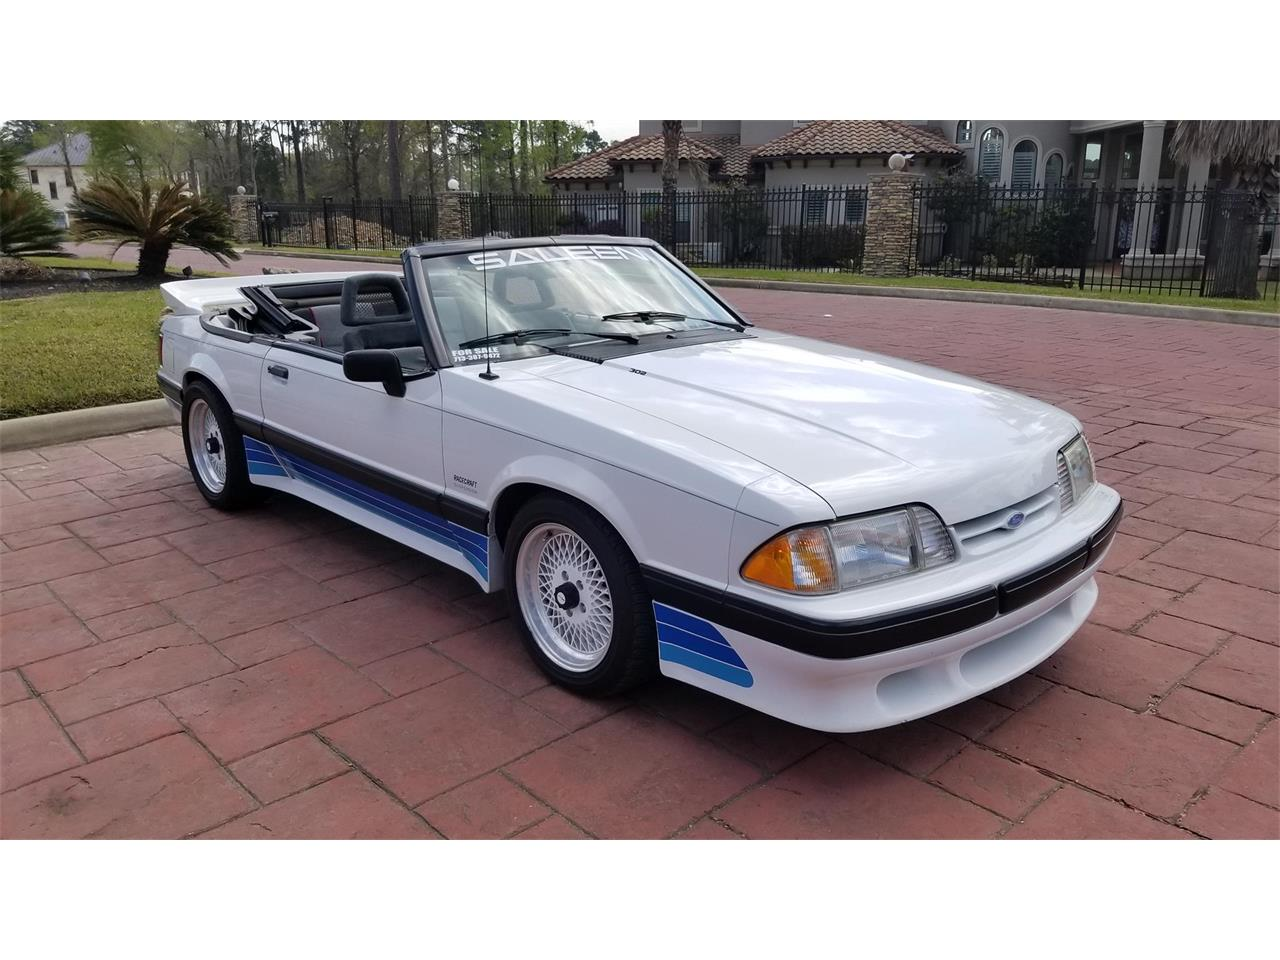 1989 Mustang Saleen For Sale